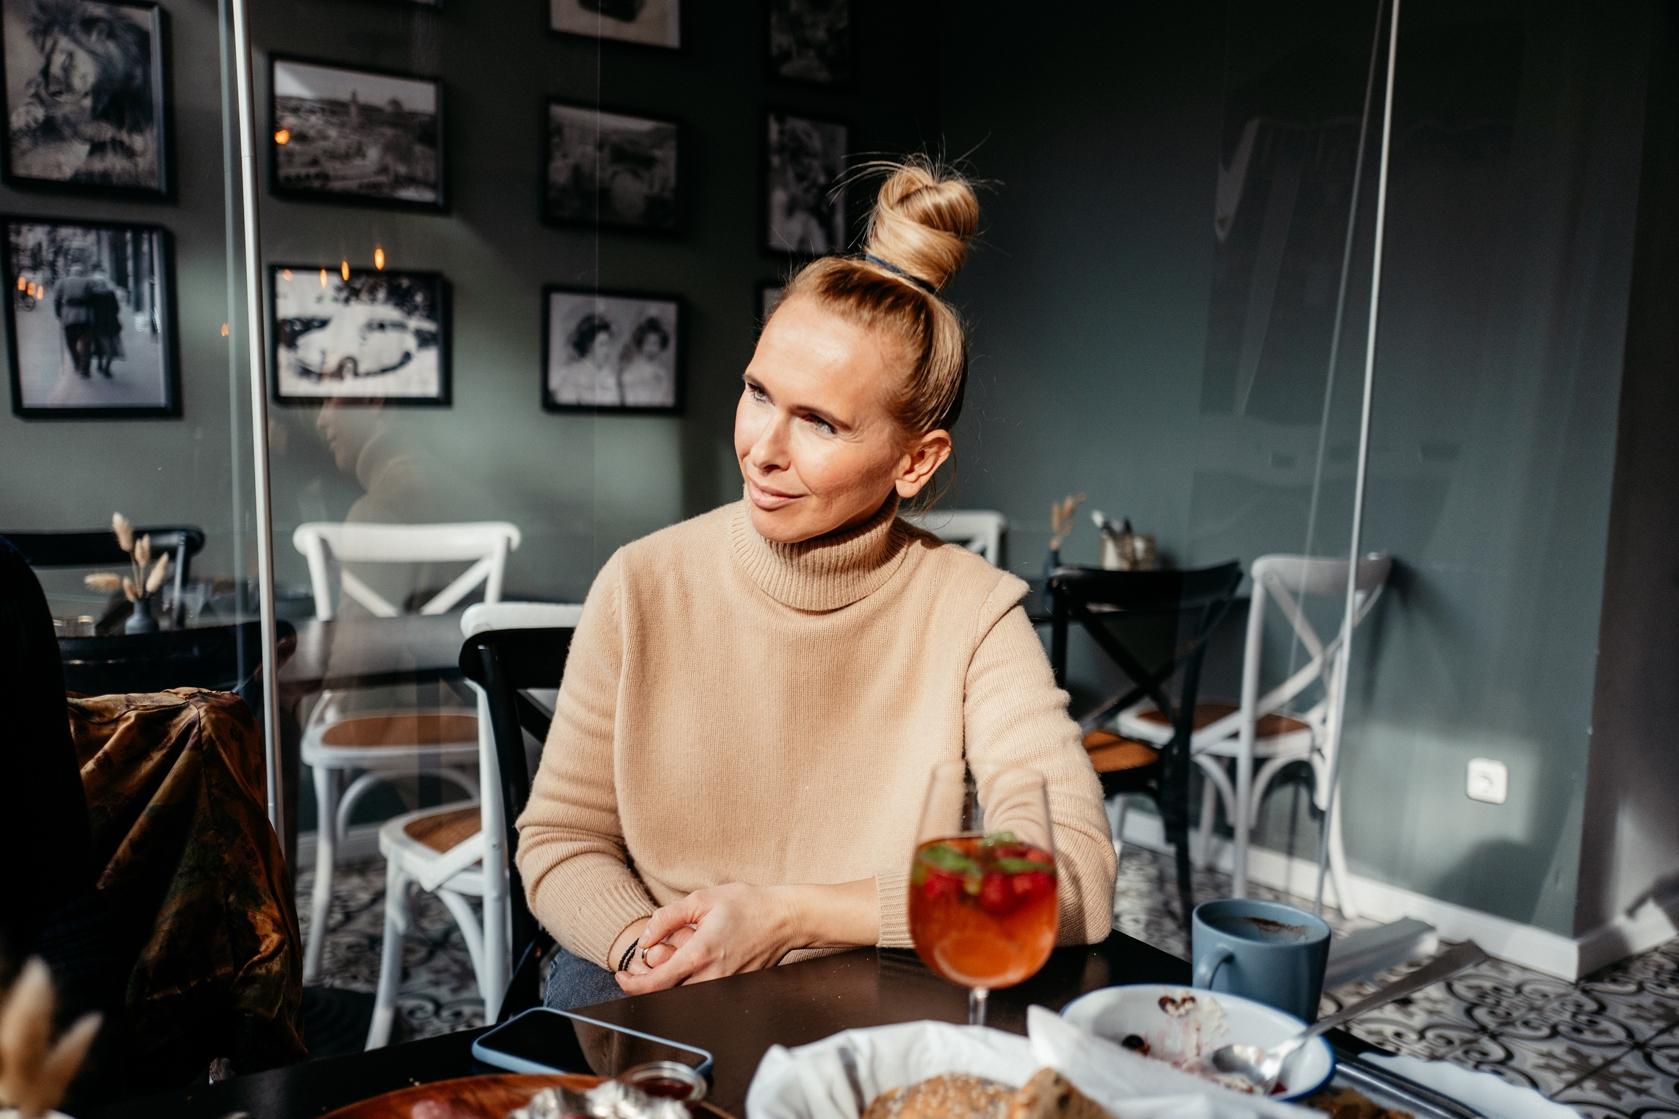 Geheimtipp Hamburg Cafe Hamm Tante Emma Dahlina Sophie Kock 058 (1)